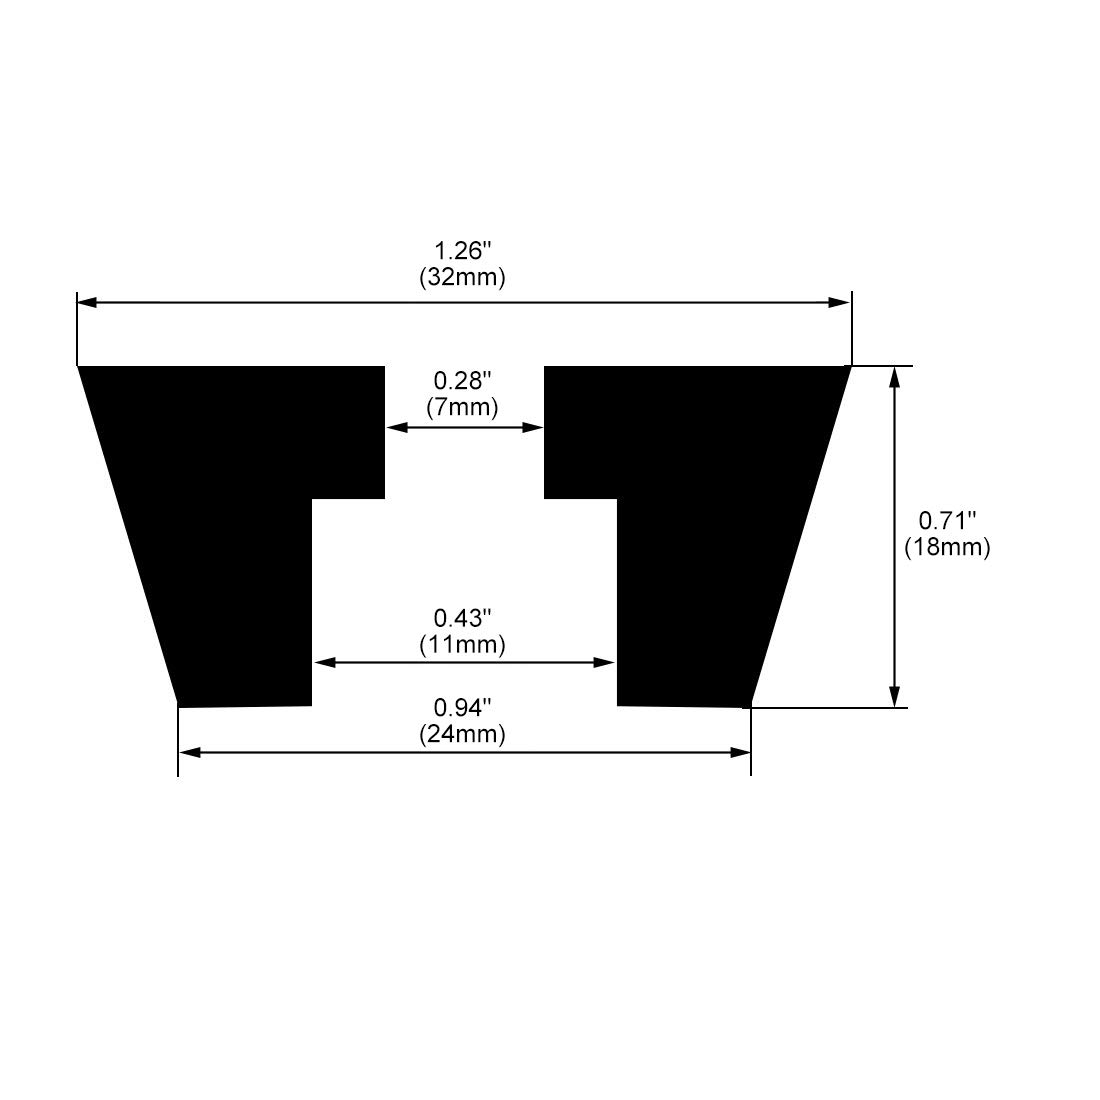 sourcing map Pies de goma paragolpes patas almohadillas amortiguadoras de D28x25xH14mm negro 12pcs